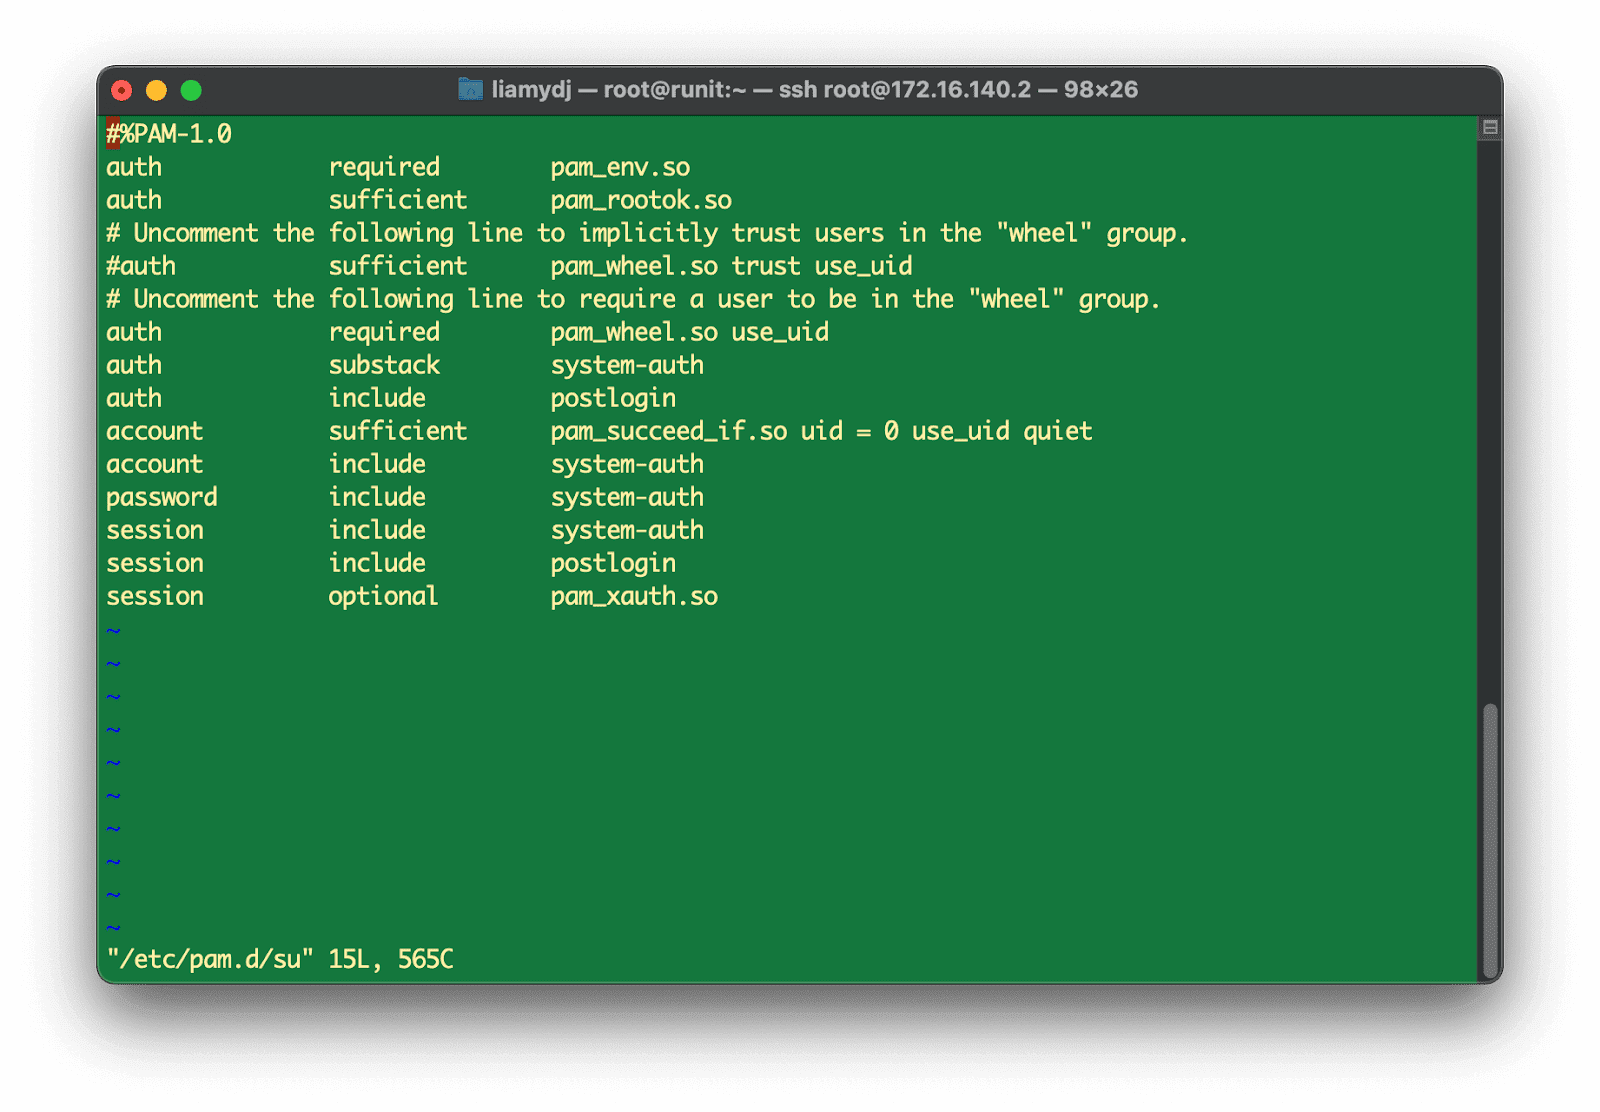 [LINUX] 리눅스 사용자 계정 관리하기